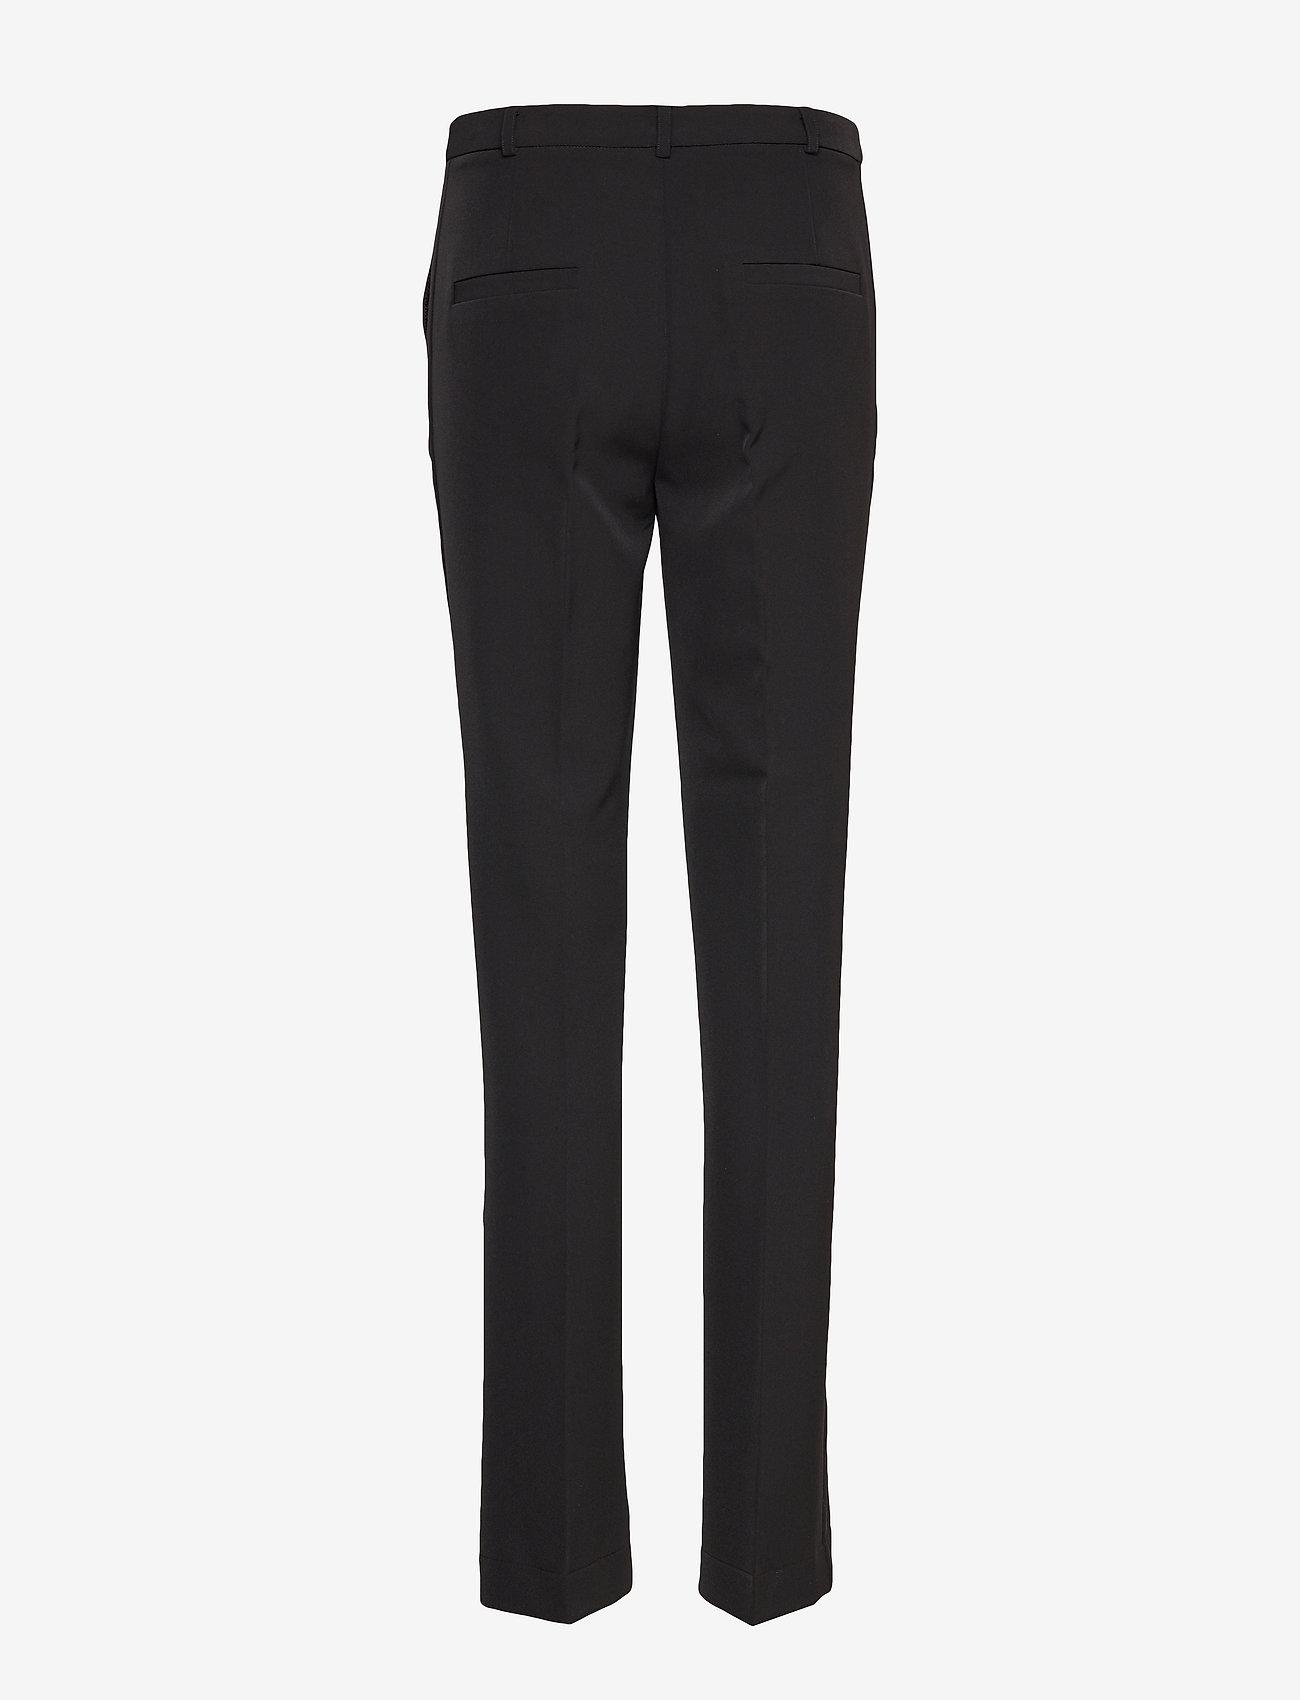 Birgitte Herskind Nanna Pants - Trousers